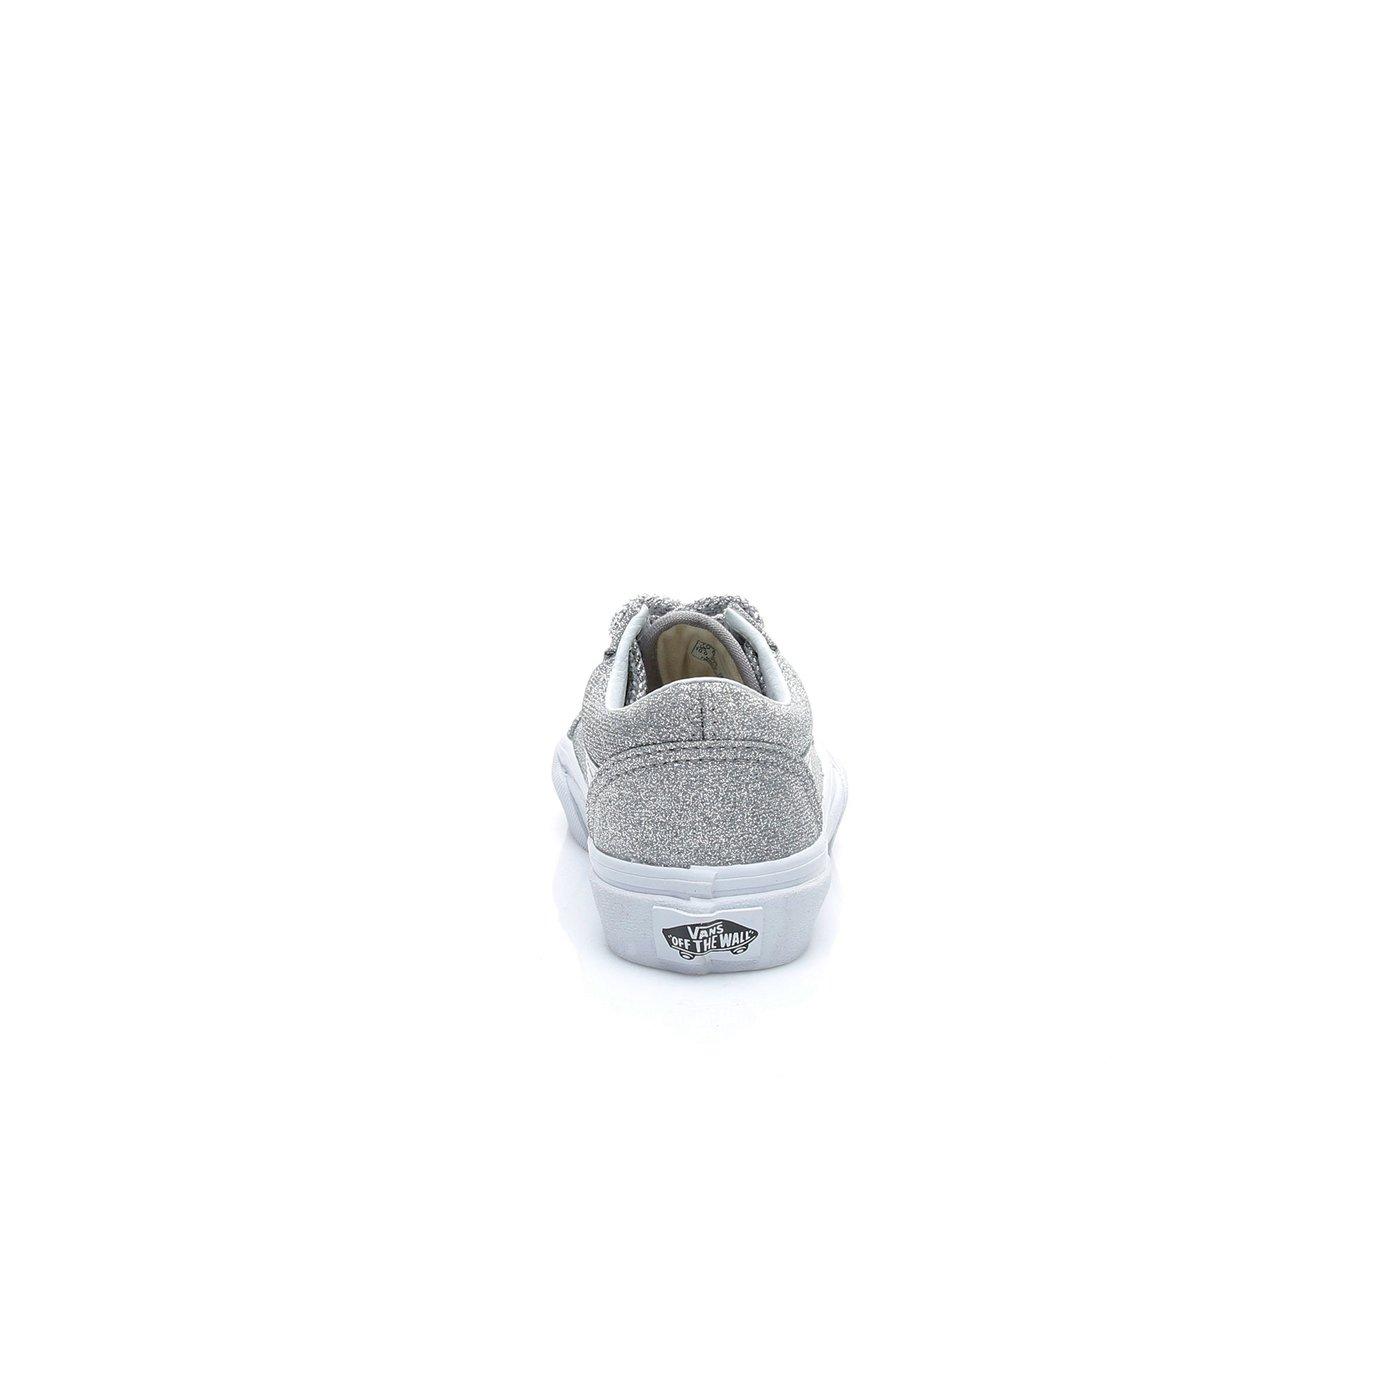 Vans UY Old Skool Unisex Çocuk Gümüş Sneaker